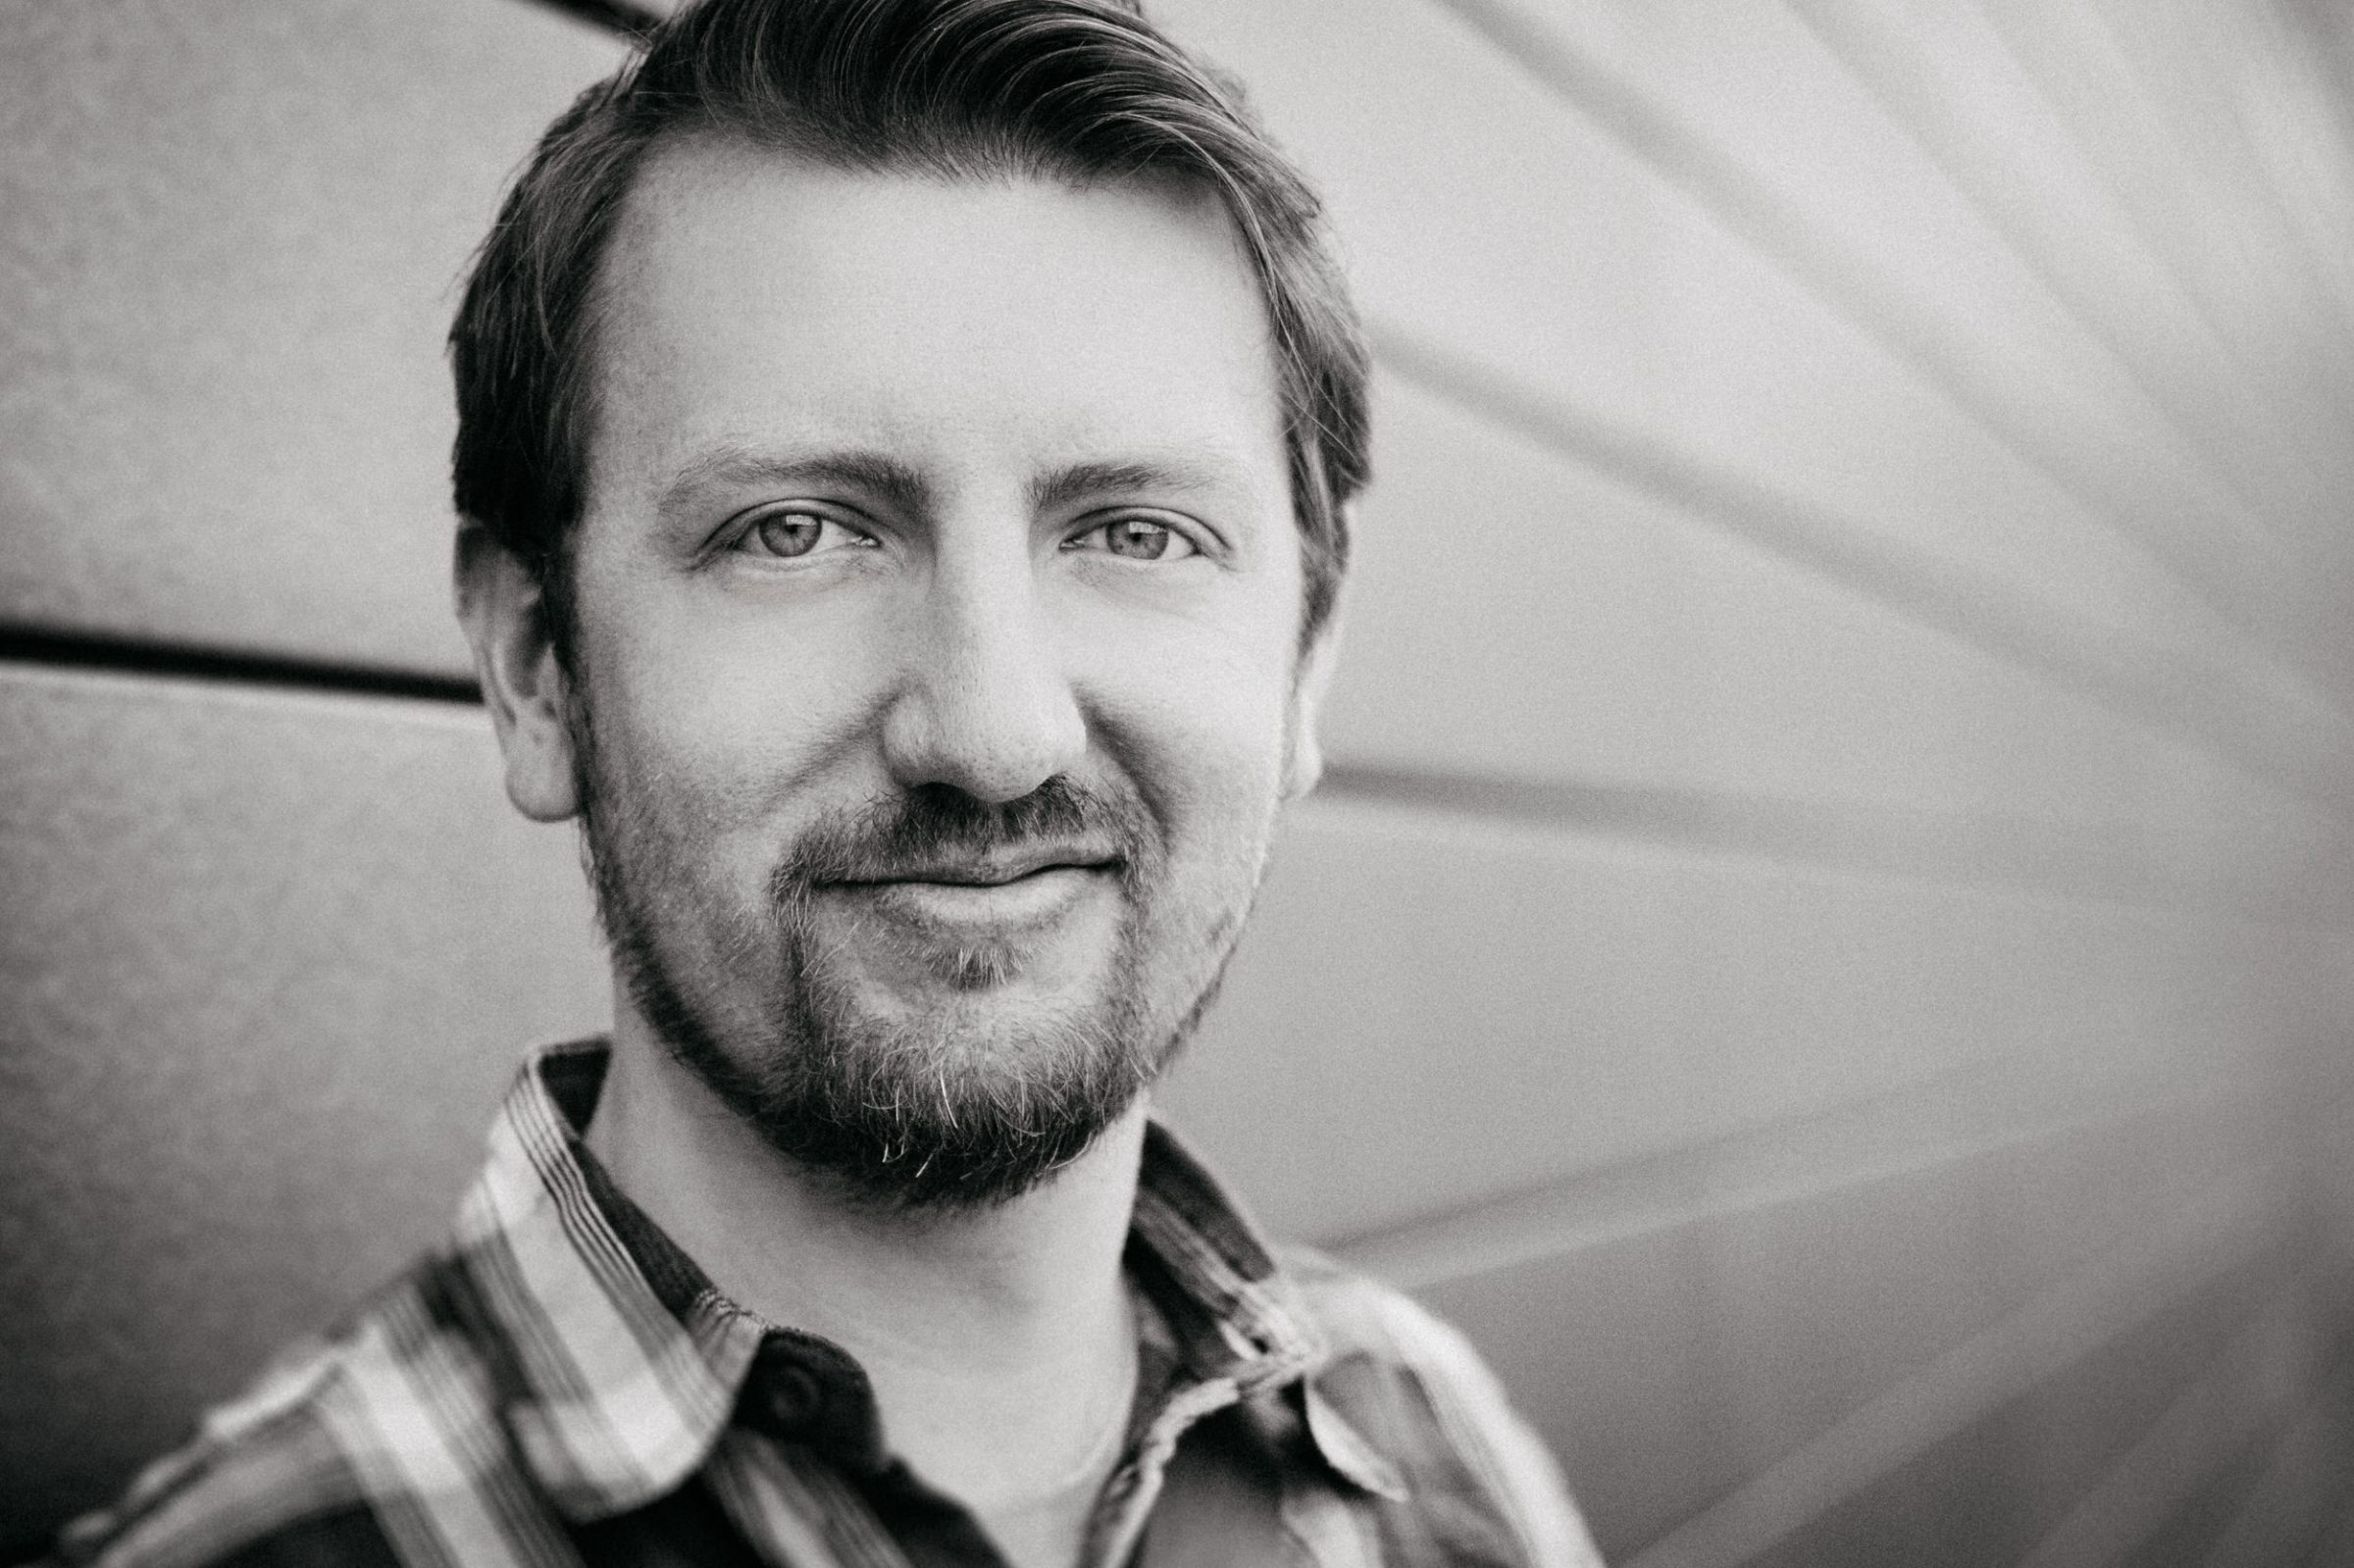 Marc Benkmann